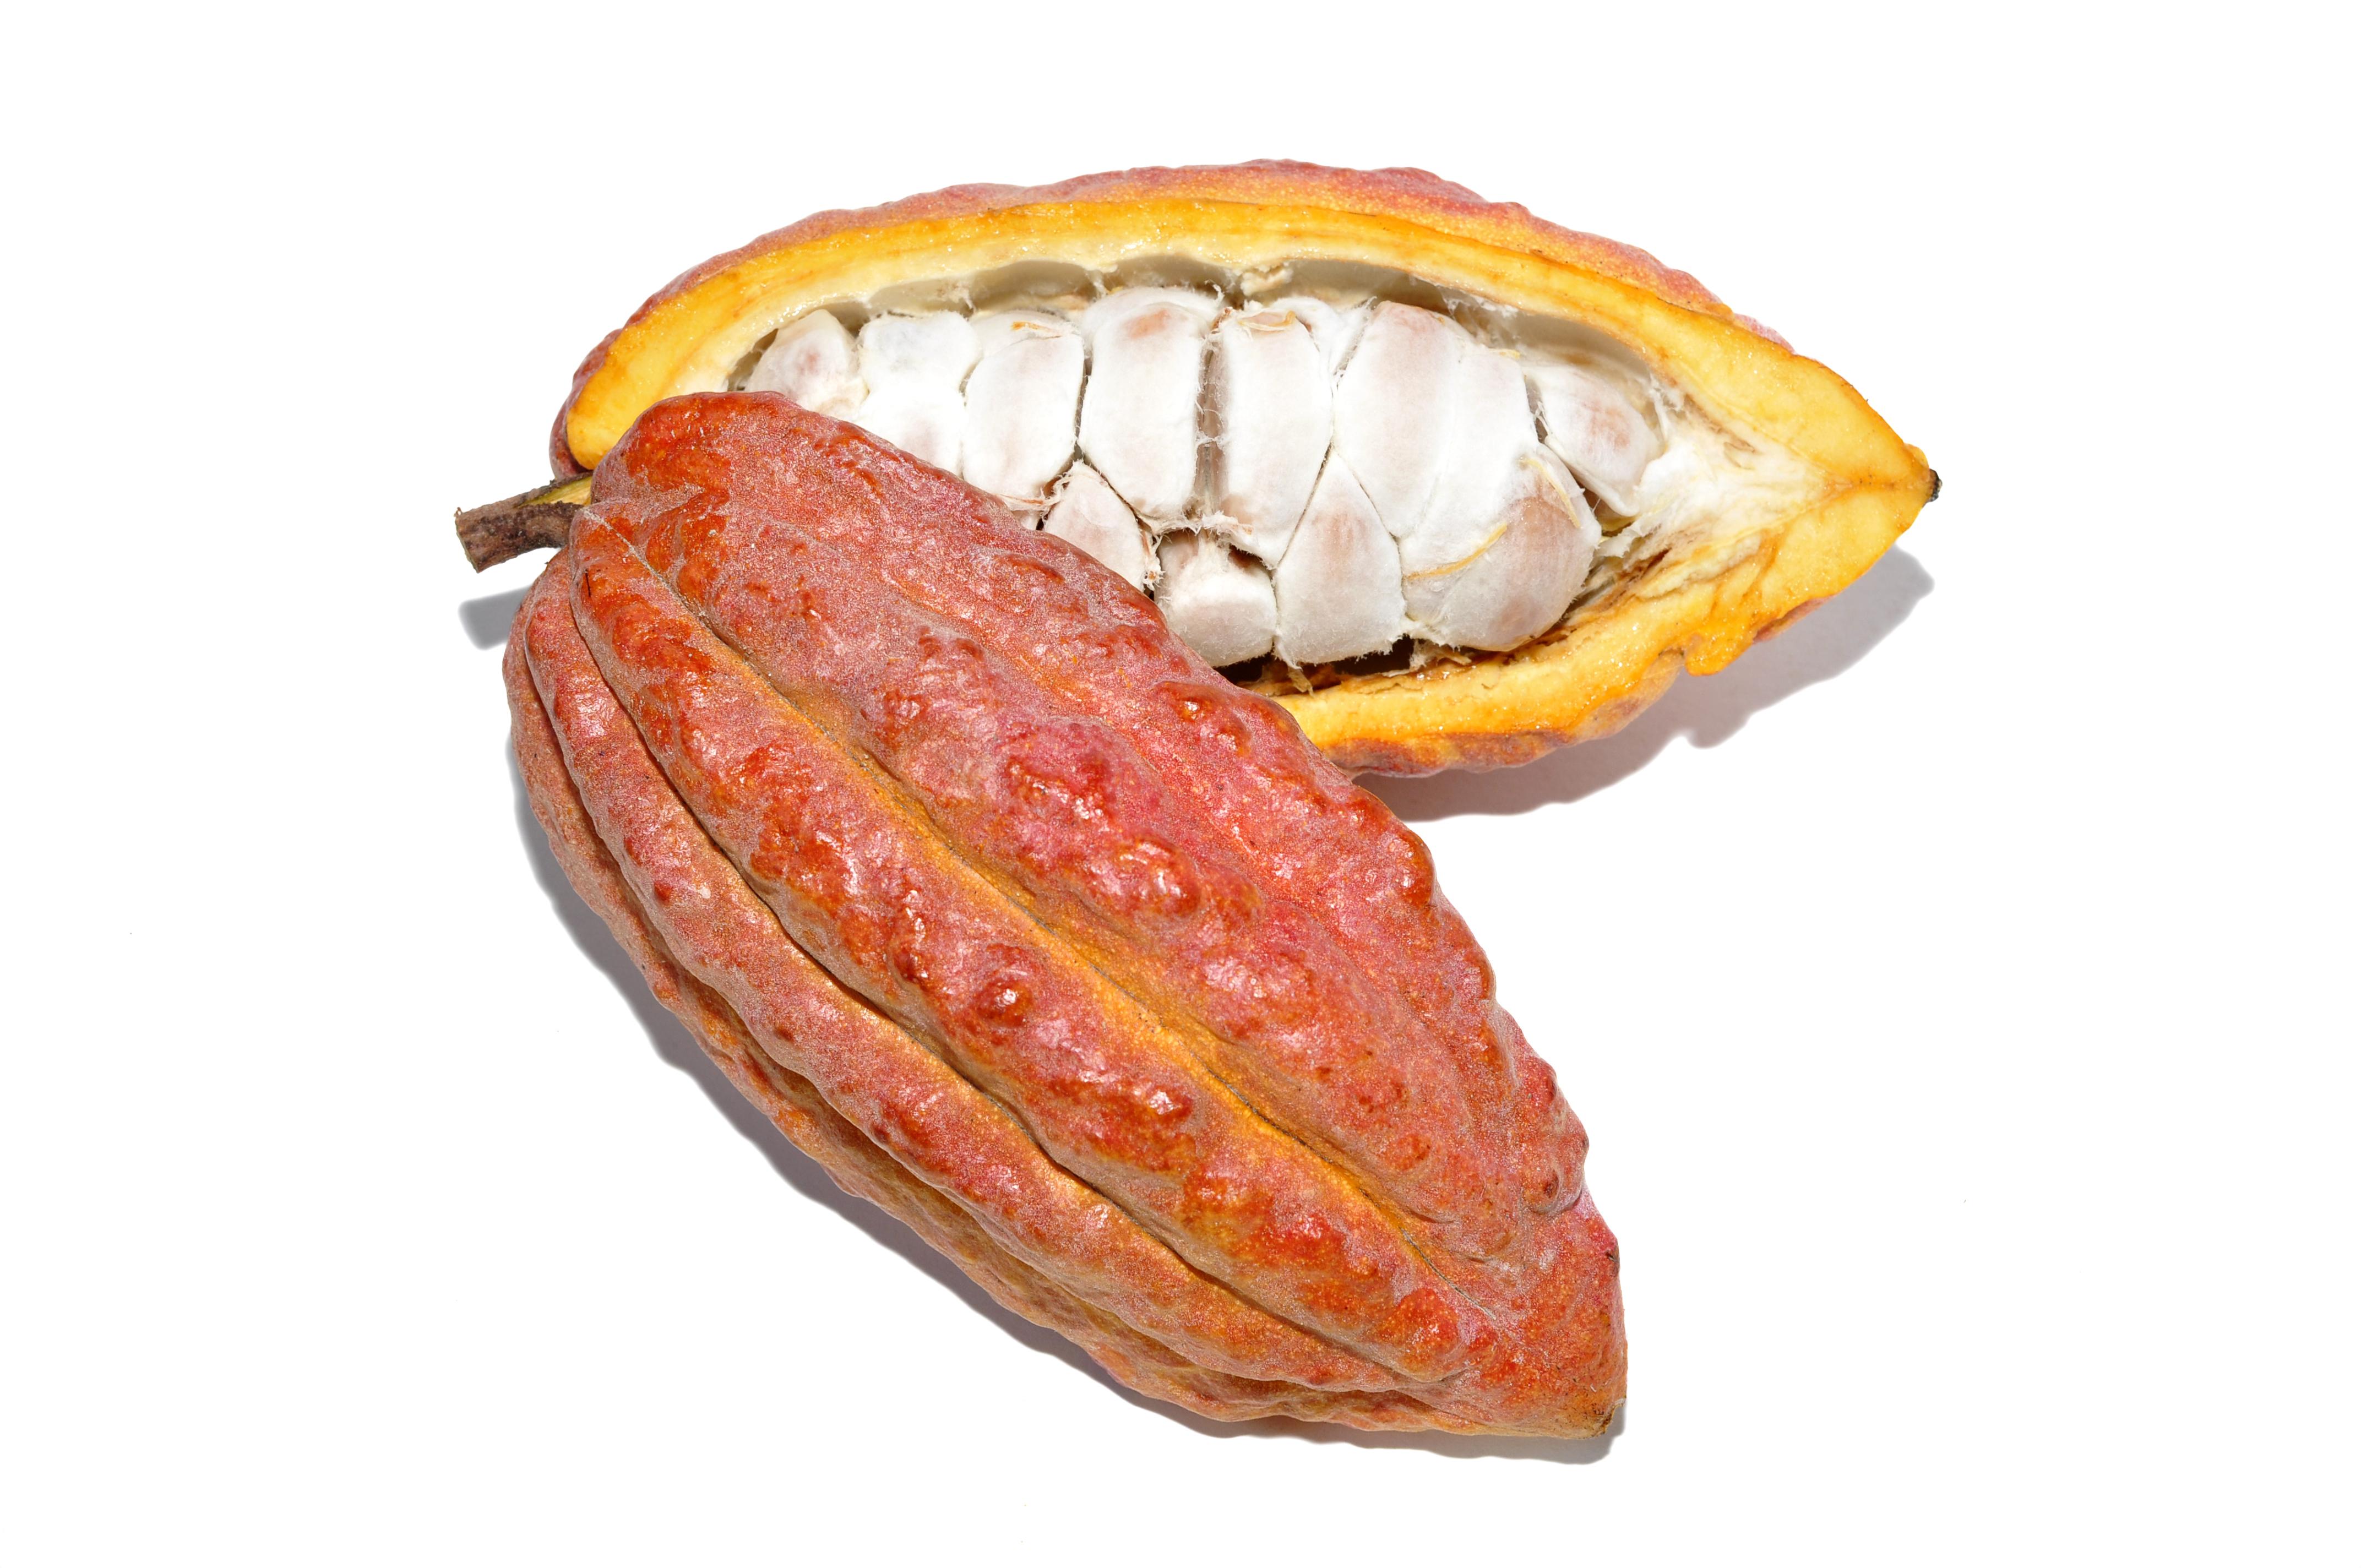 Plod kakaovníku odrůdy Criollo